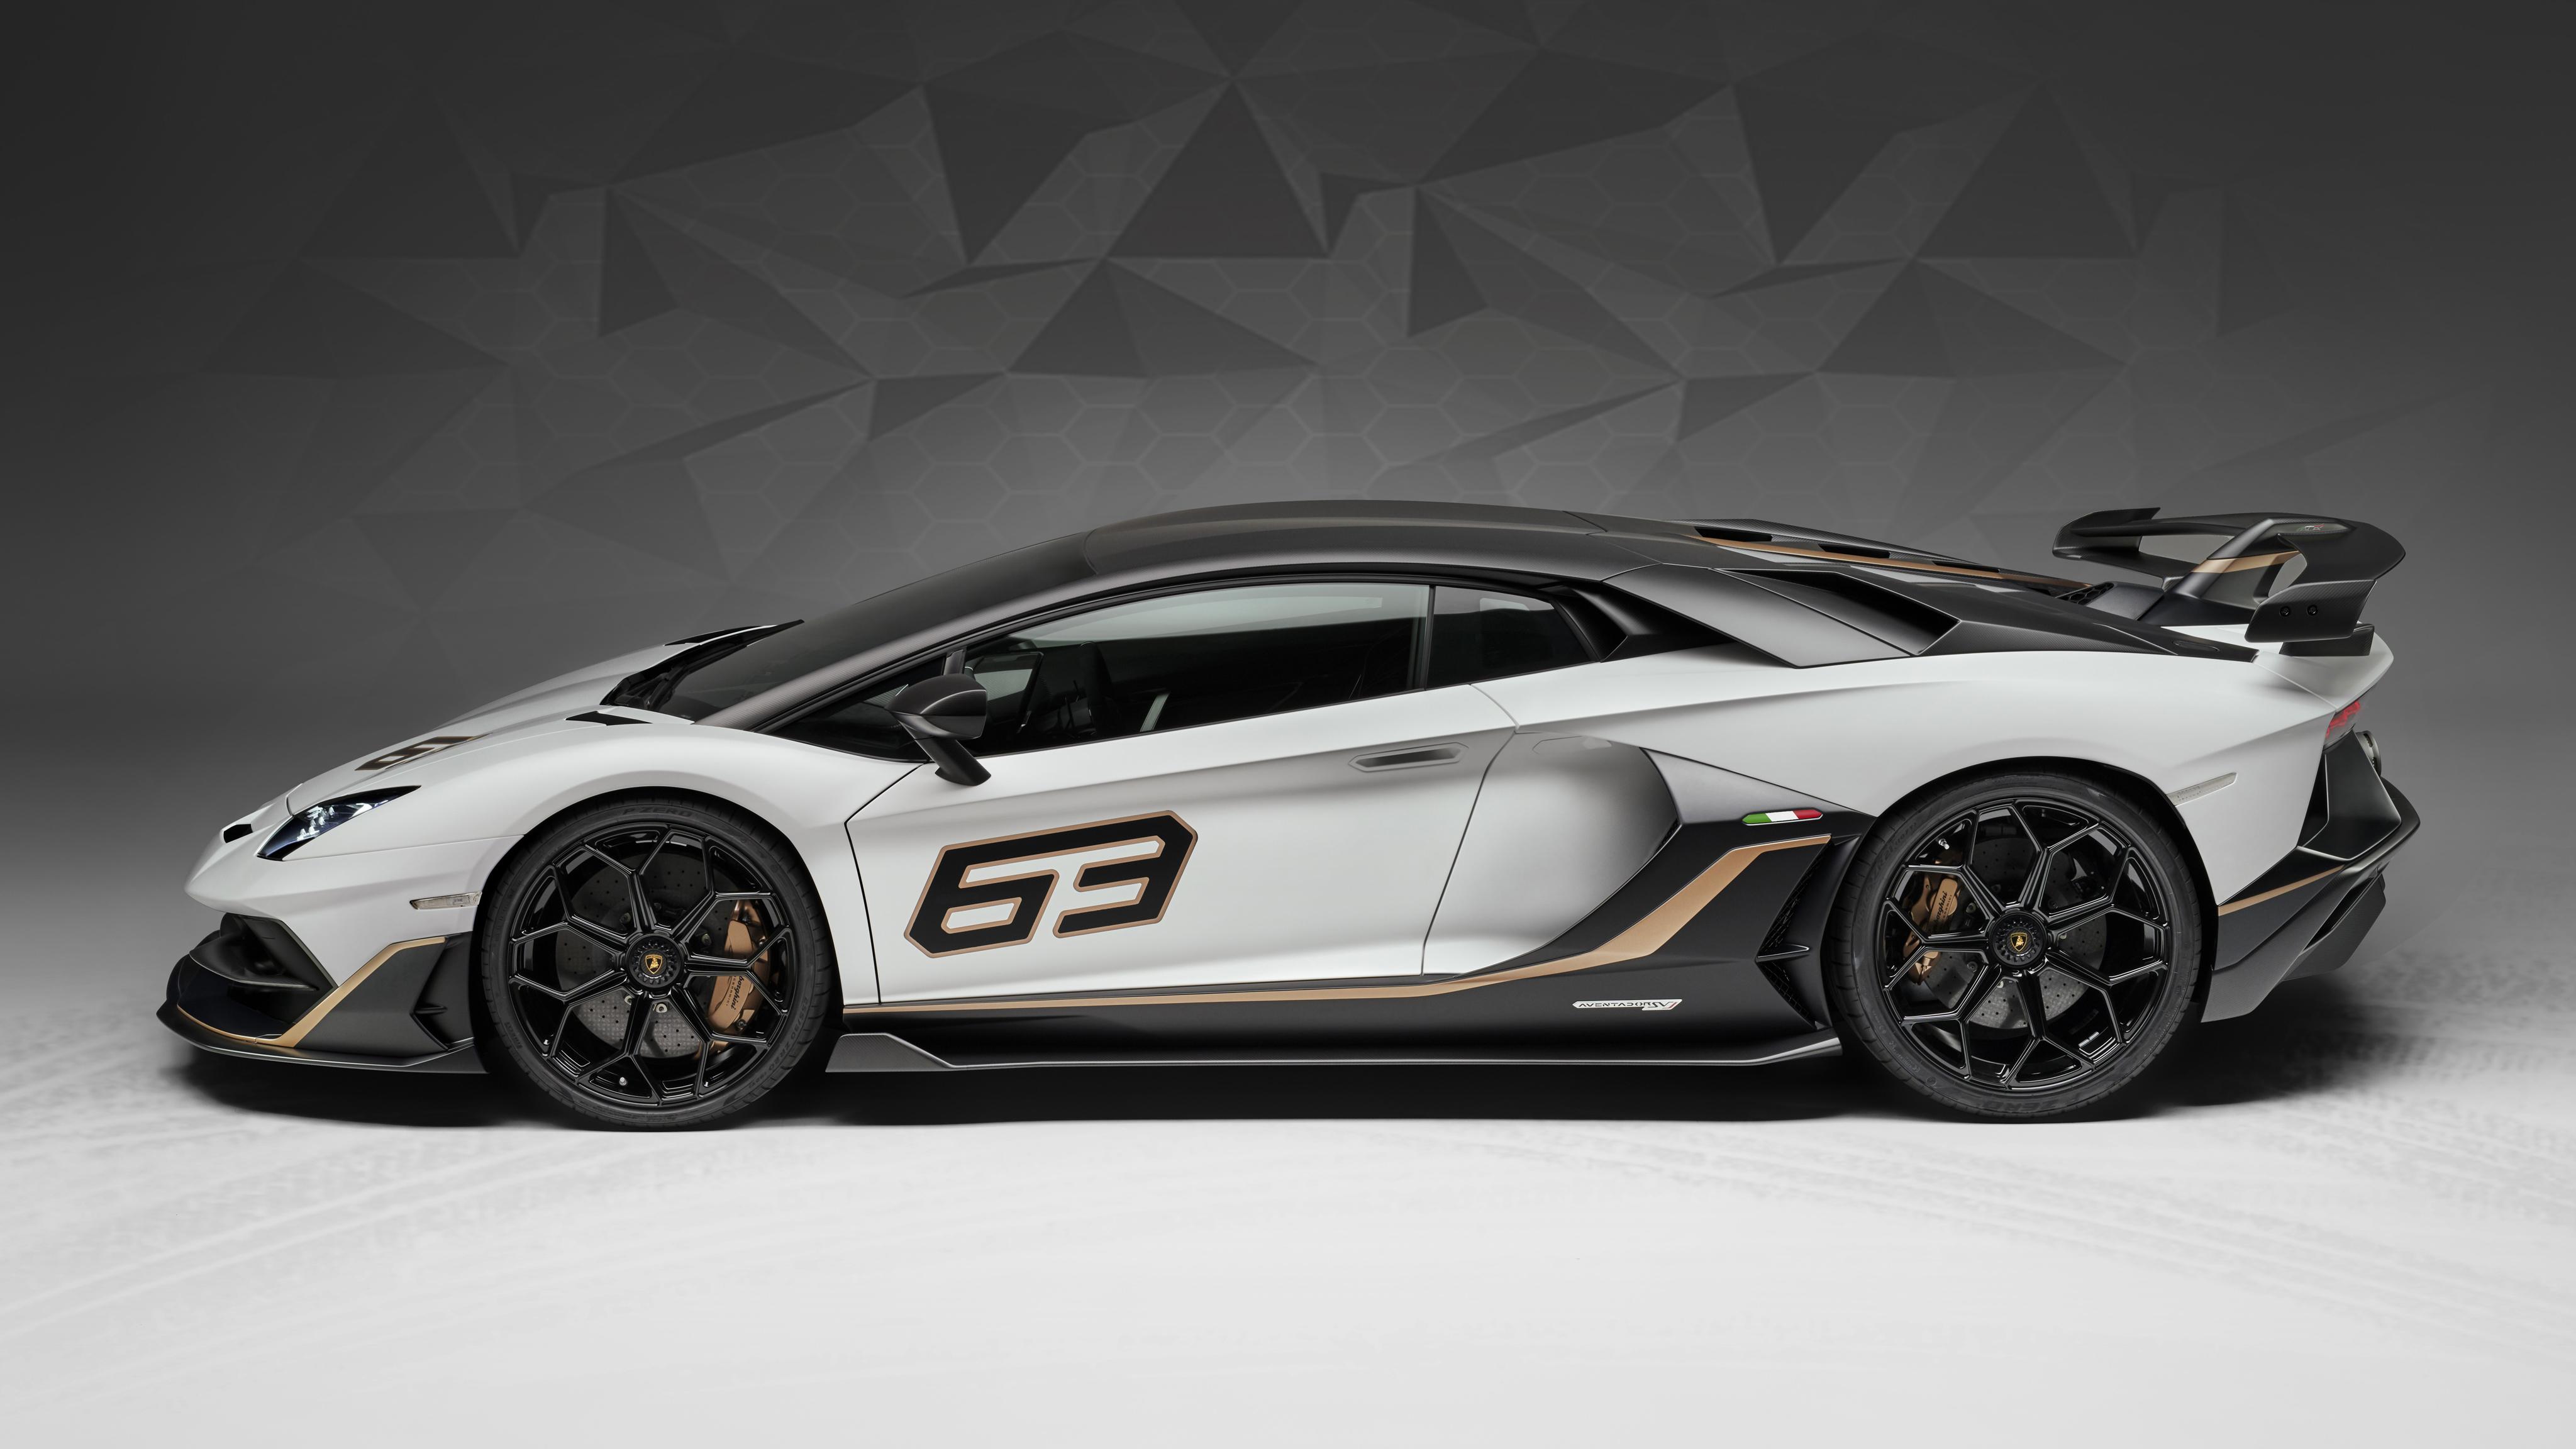 Lamborghini Aventador Svj 63 2019 4k 3 Wallpaper Hd Car Wallpapers